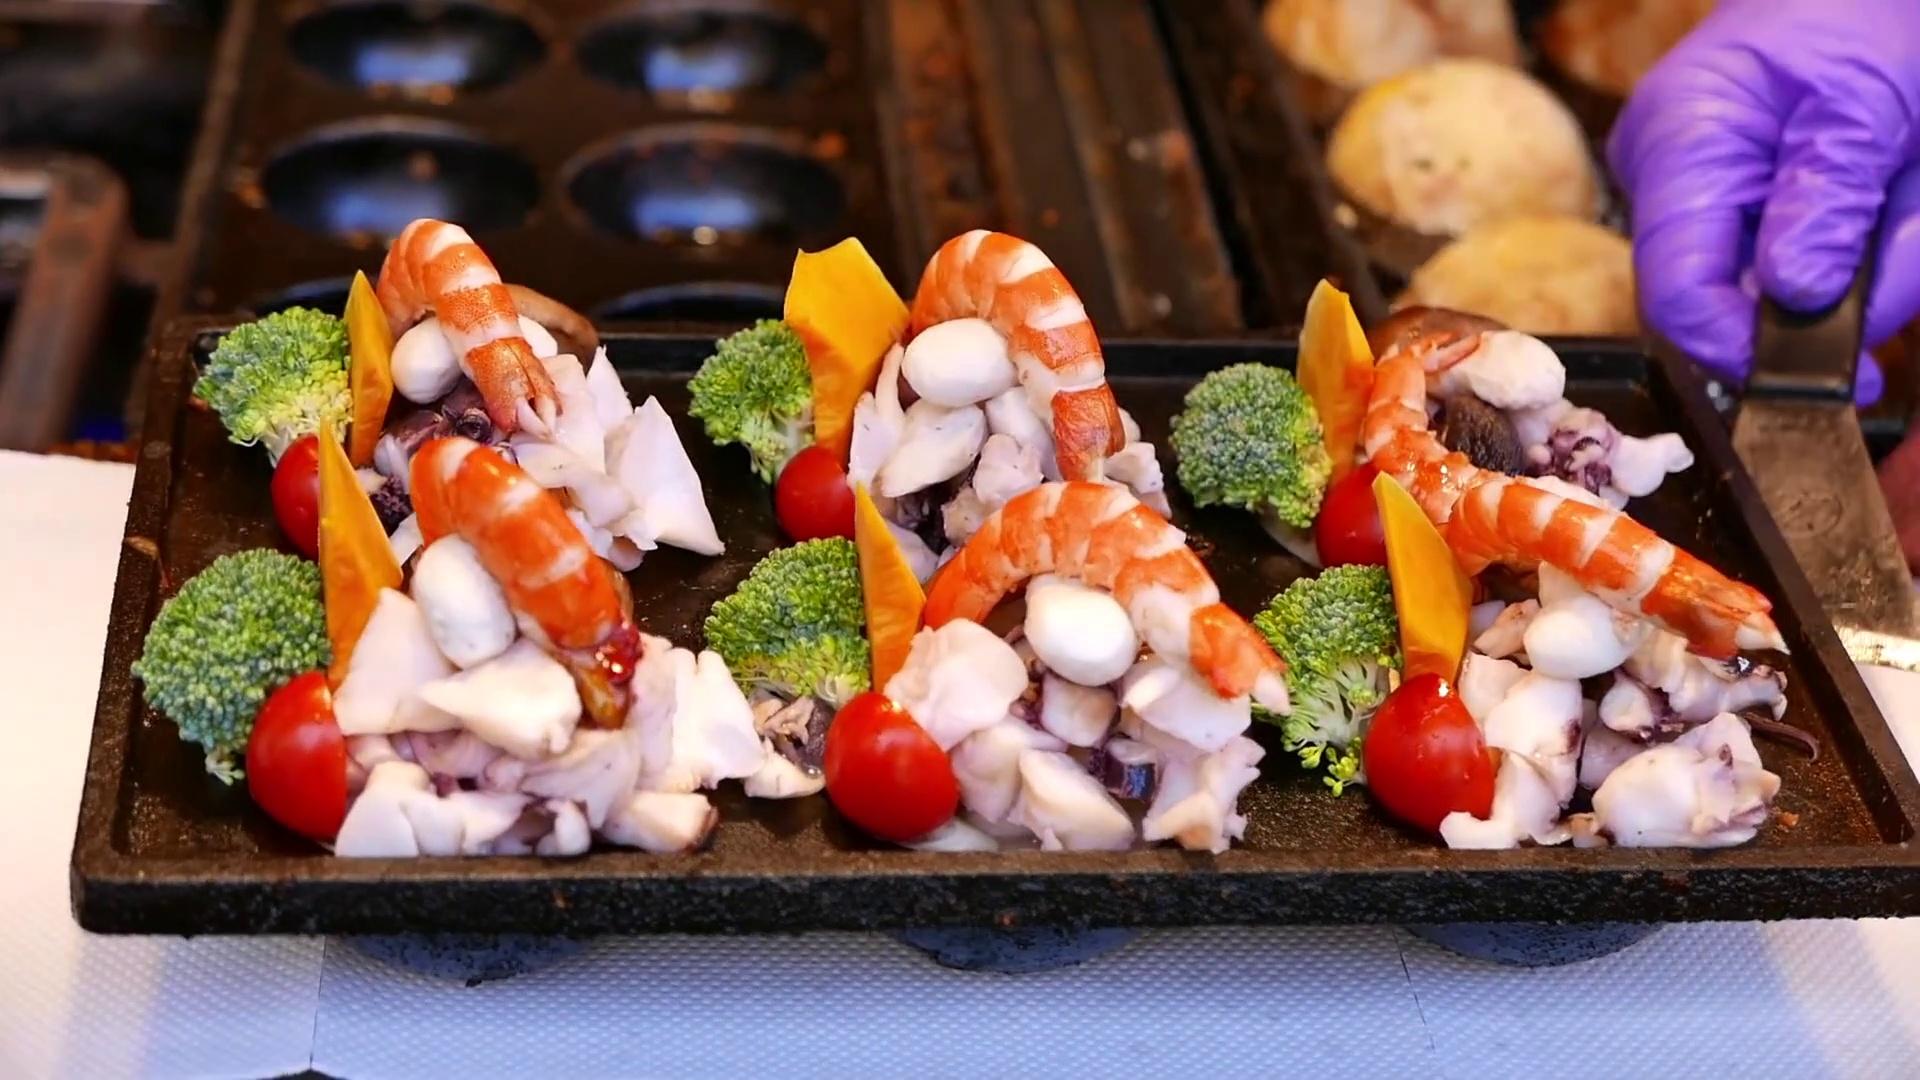 Street Food Market Discovery   Taiwanese Street Food – LIVE GIANT PRAWNS Shrimp Seafood Balls Kaohsiung Taiwan